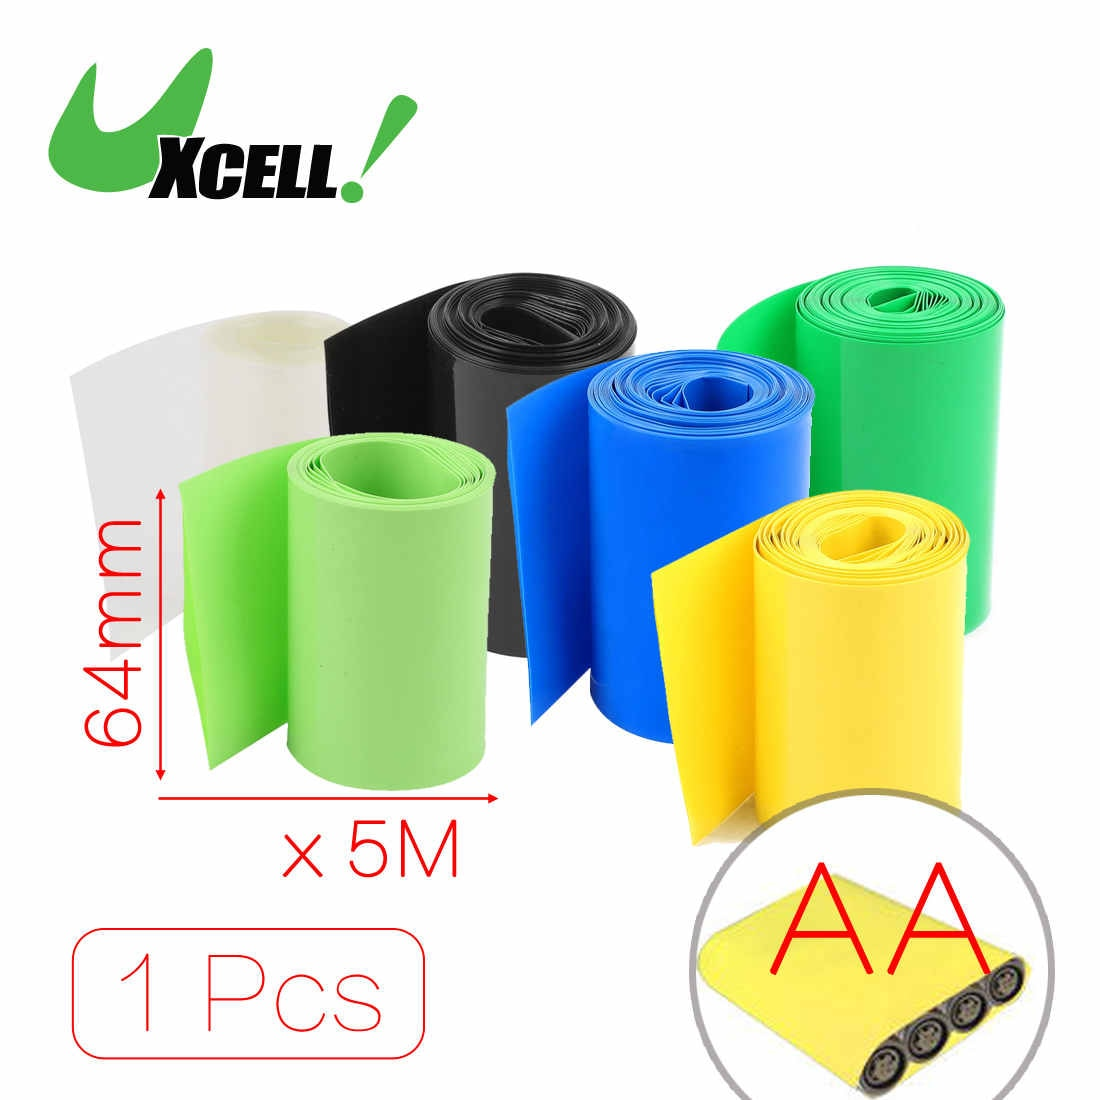 Термоусадочная трубка Uxcell, 5 метров, ширина 64 мм, ПВХ, желтая, для аккумуляторной батареи Aa, черная, синяя, прозрачная, зеленая, желтая